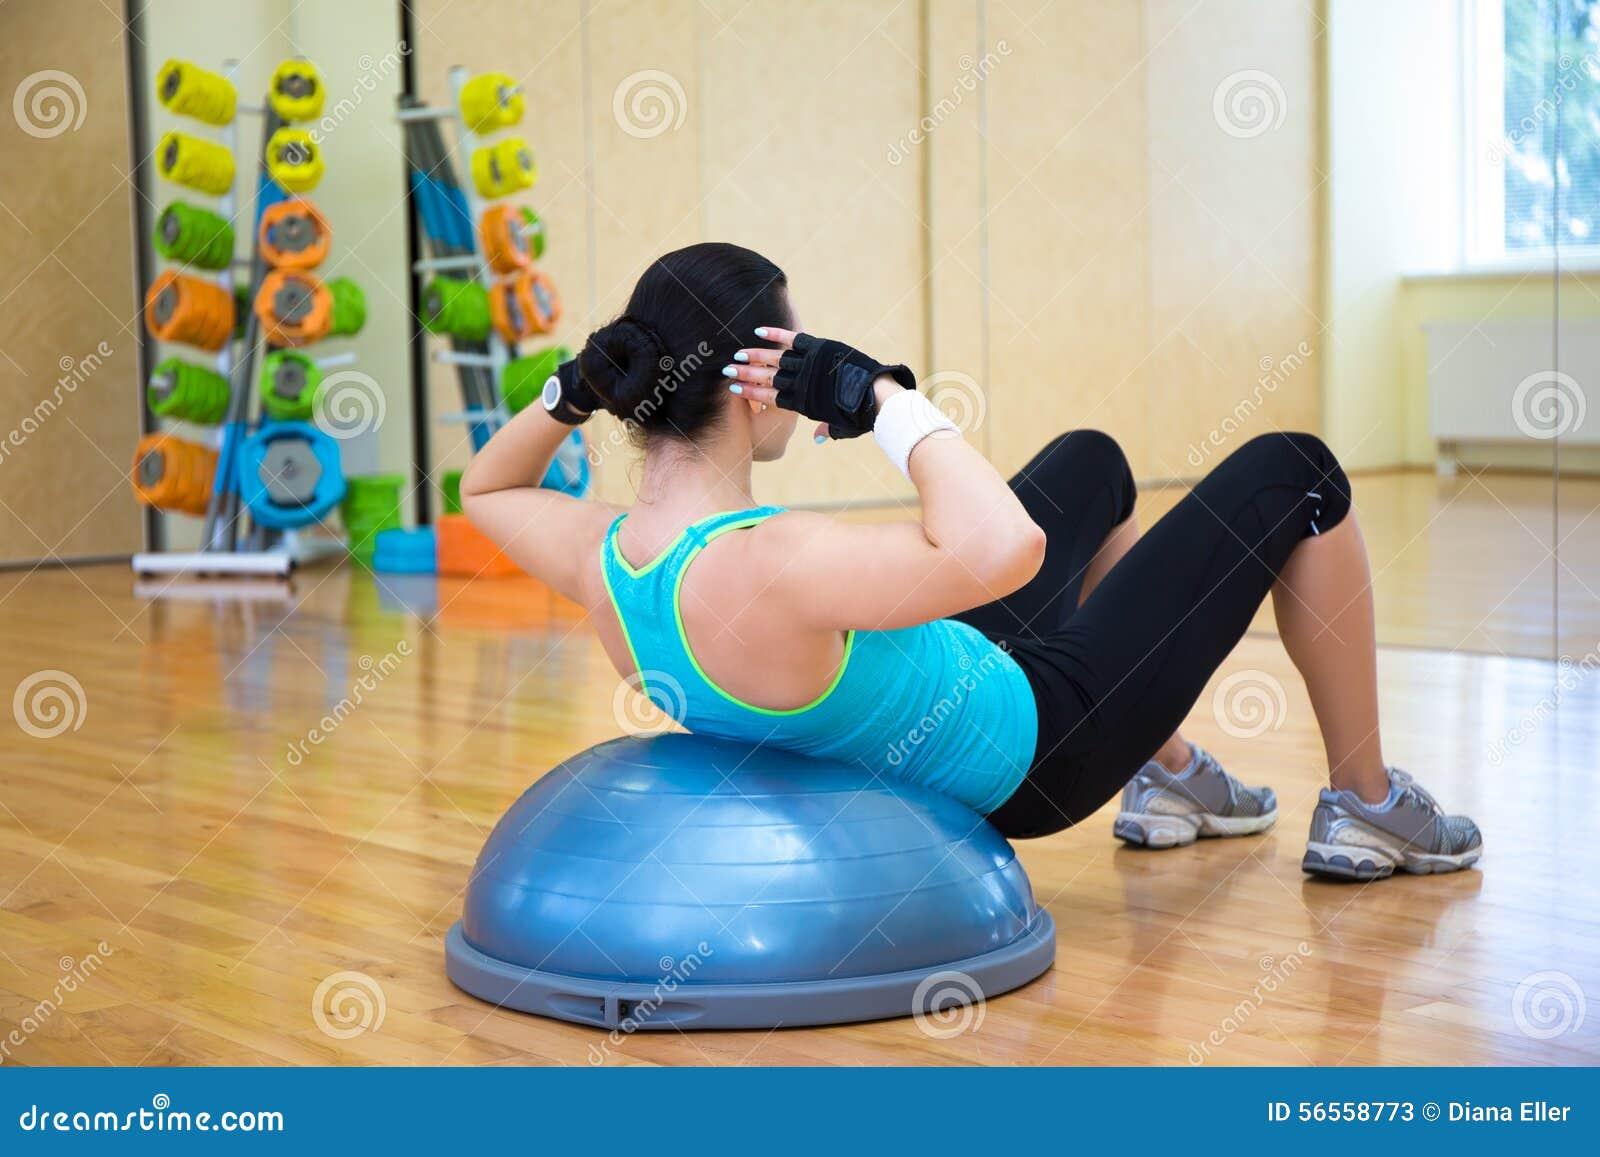 Download Λεπτή γυναίκα που επιλύει με τη σφαίρα Bosu στη γυμναστική Στοκ Εικόνα - εικόνα από leisure, μυϊκός: 56558773